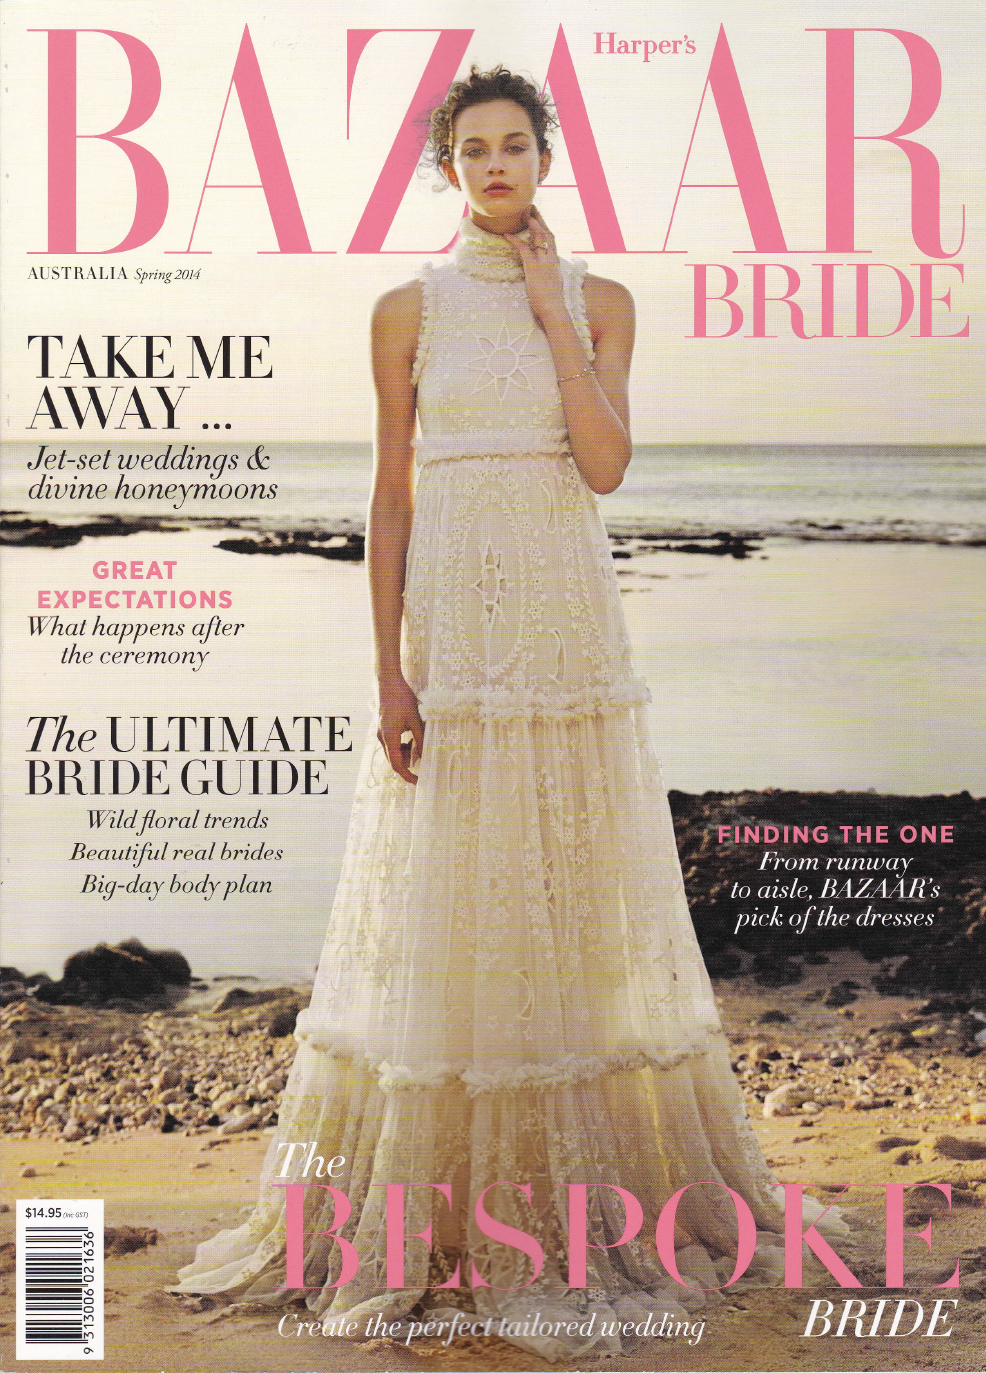 Bazaar-Bride-Spring-2014.jpg